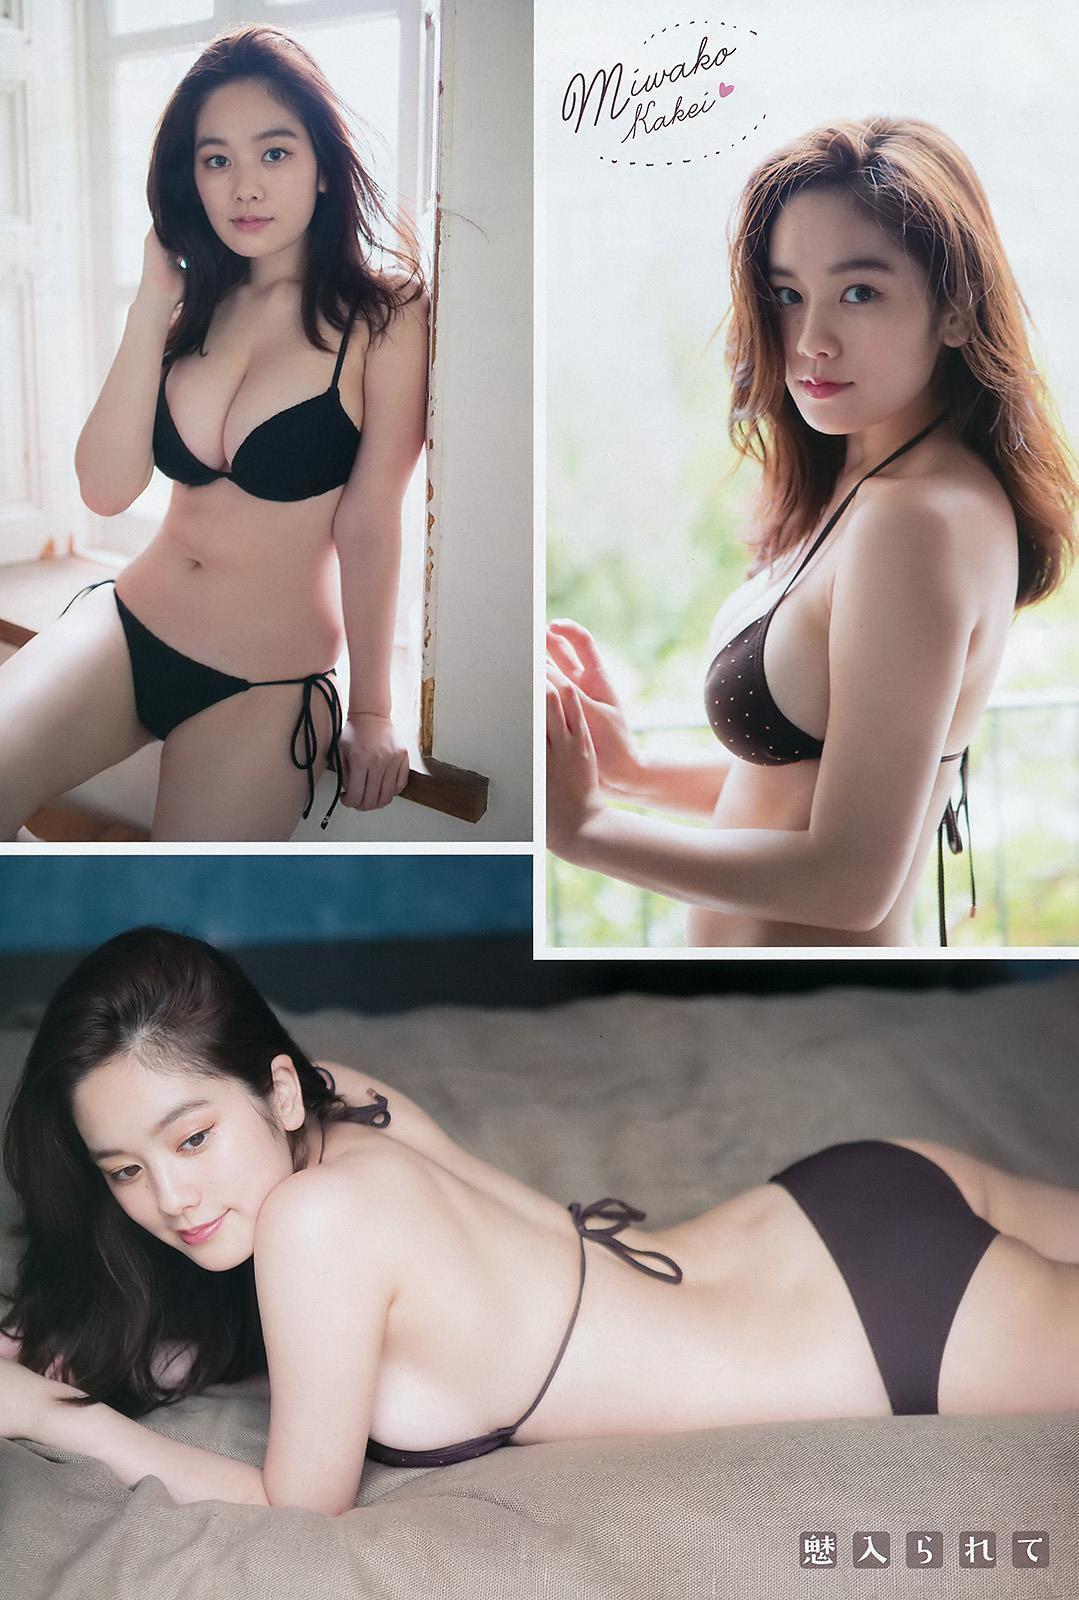 kakei_miwako182.jpg